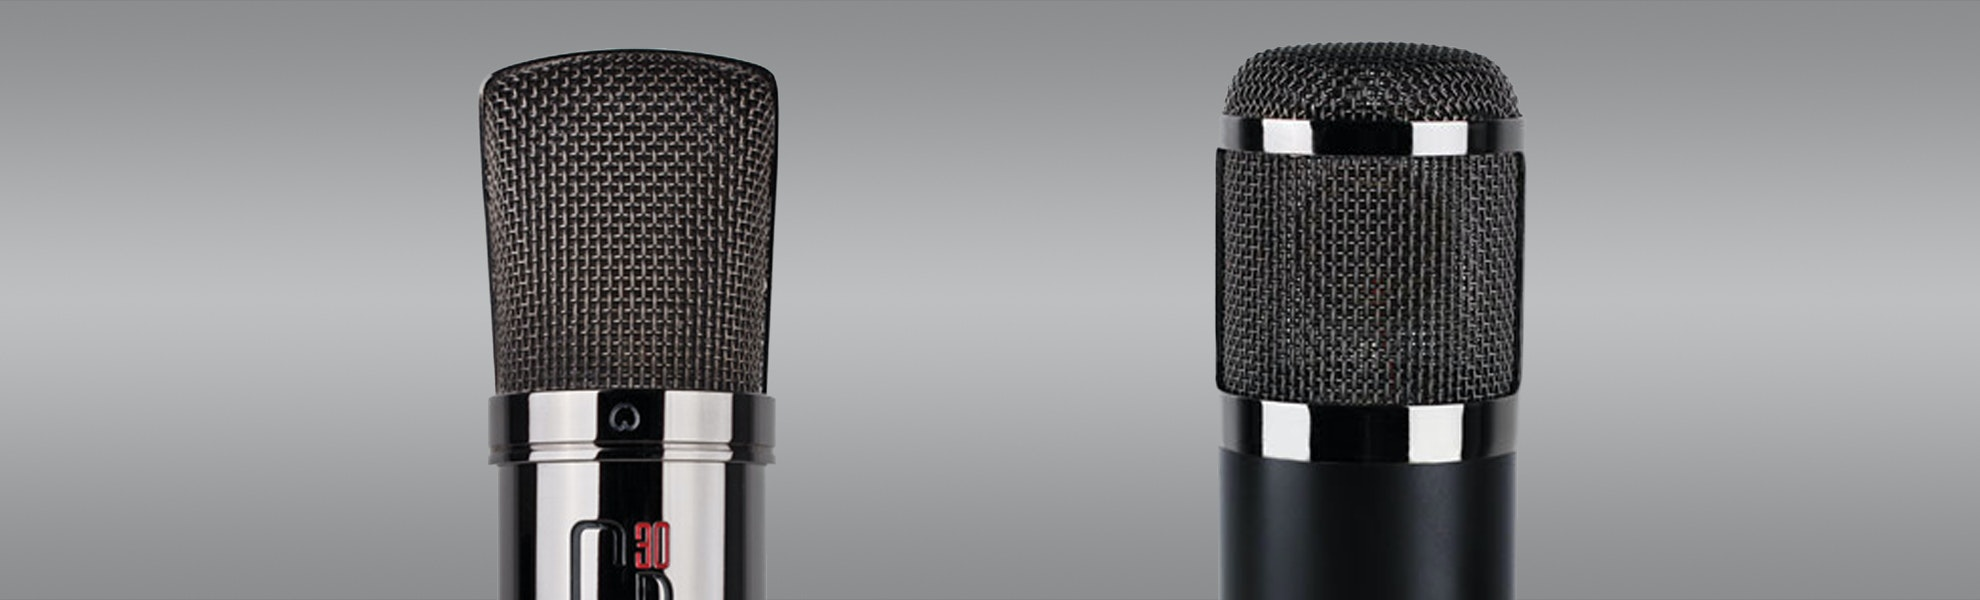 MXL CR30 & CR89 Microphones